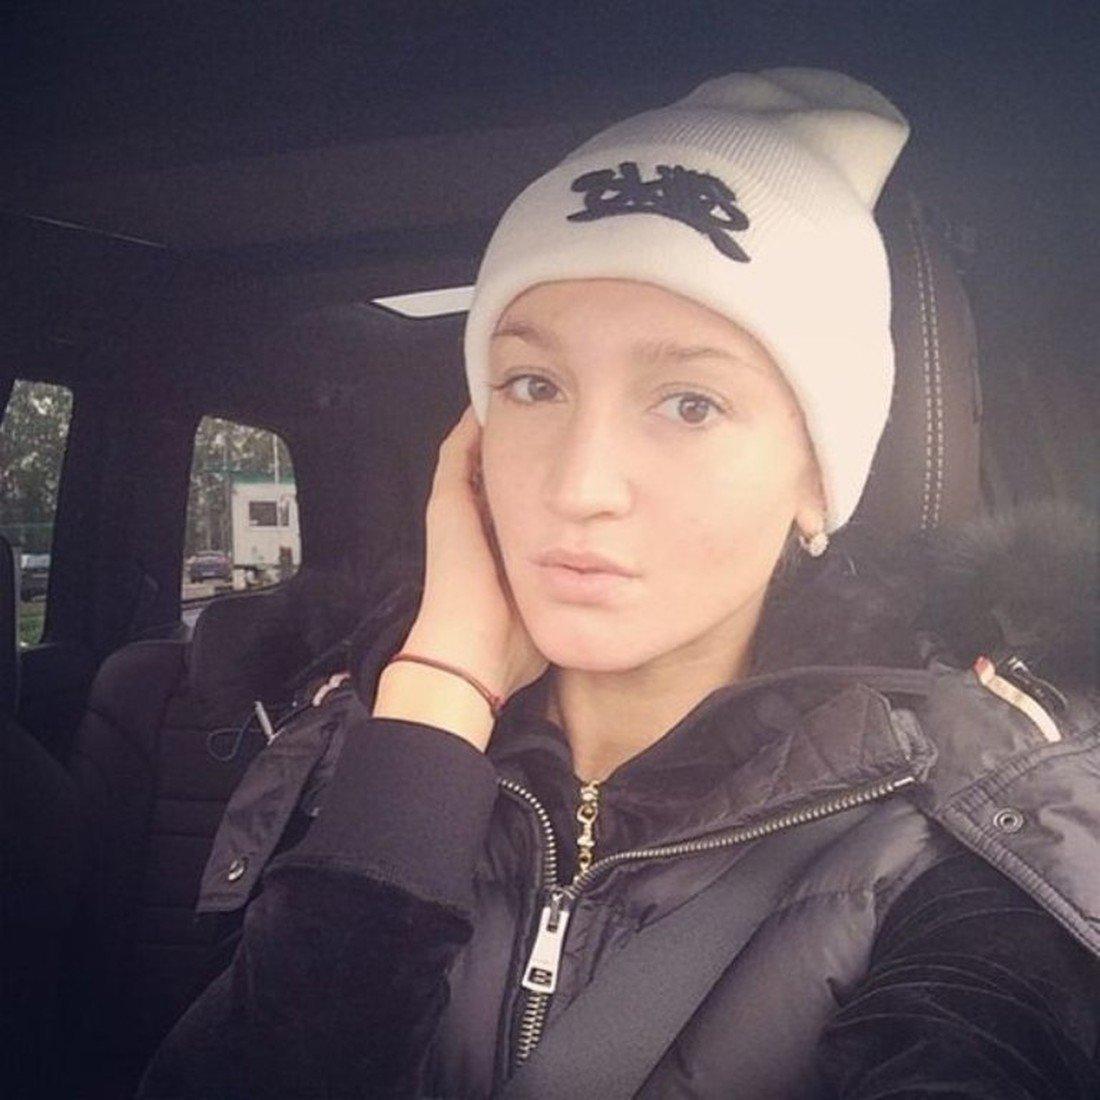 Ольга Бузова предстала перед телекамерами без макияжа